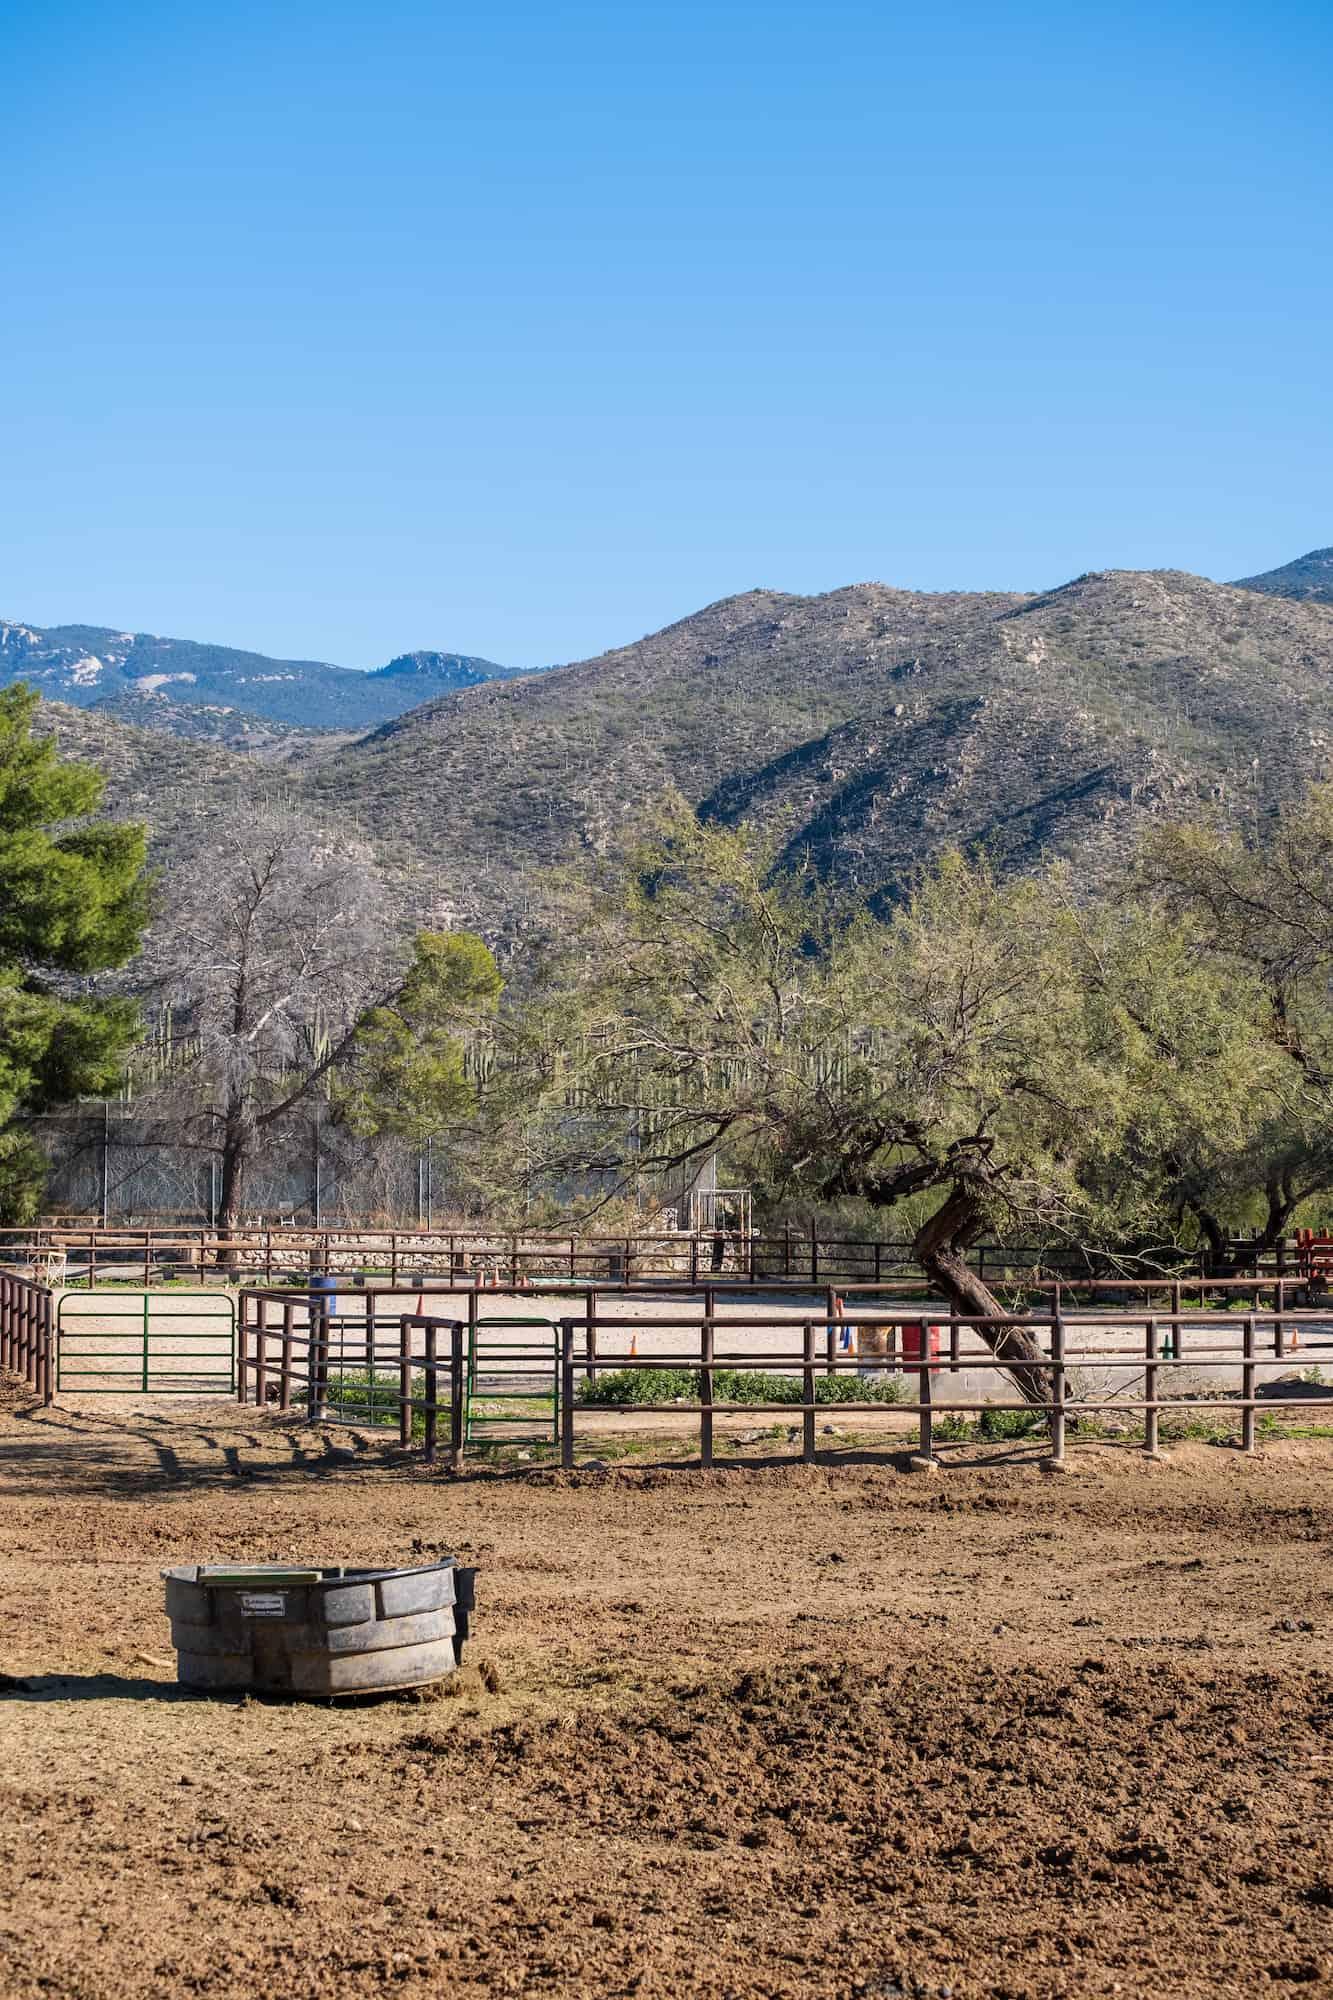 Dude Ranch Weekend in Tucson